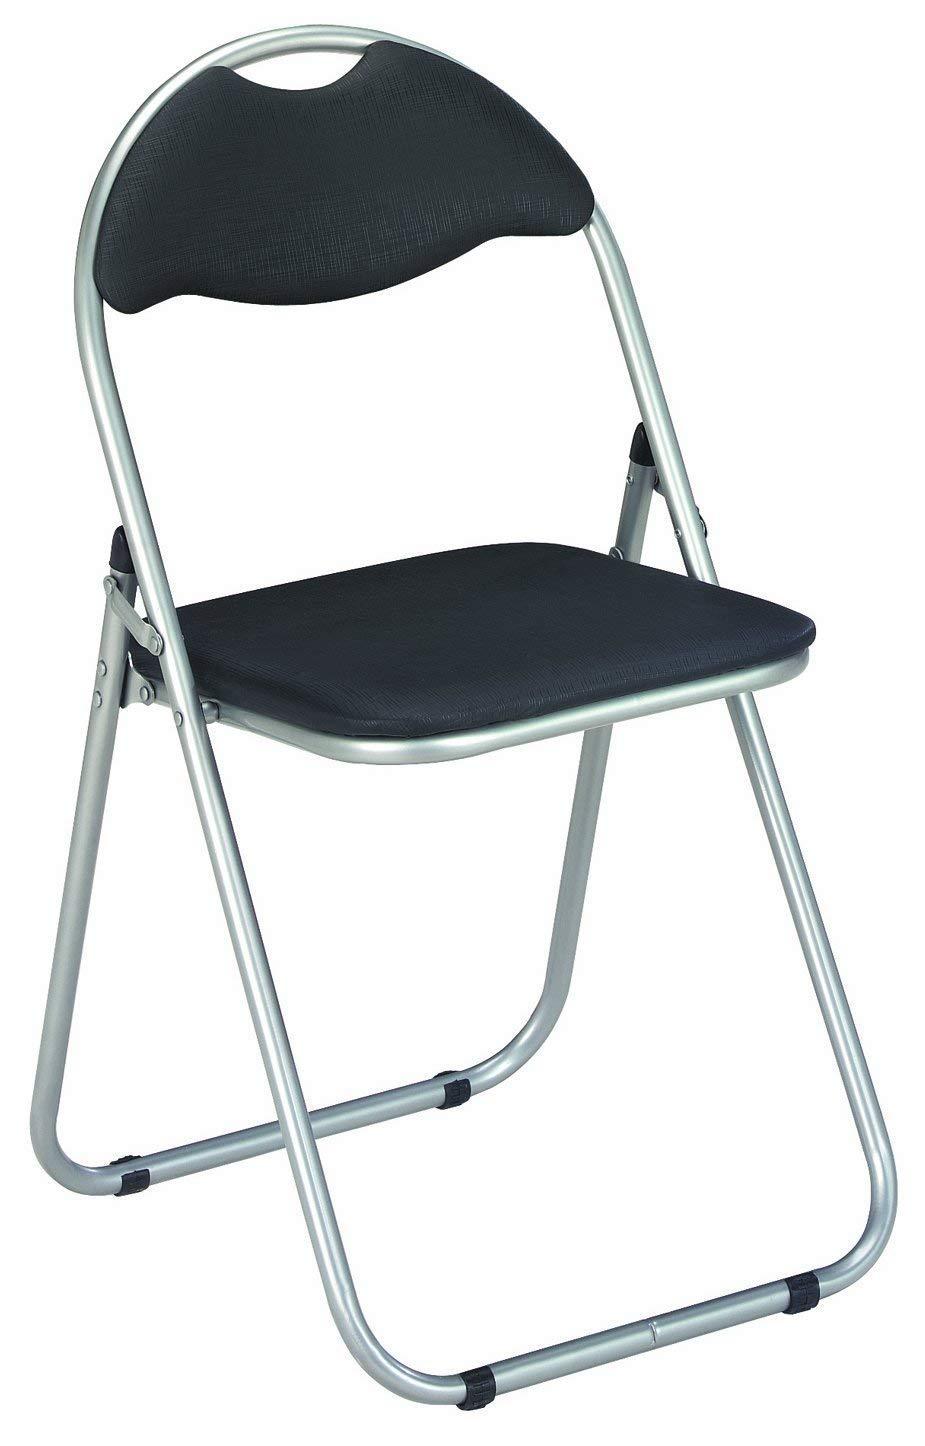 Haku Möbel - Lote de 6 sillas Plegables (Metal), Metal ...